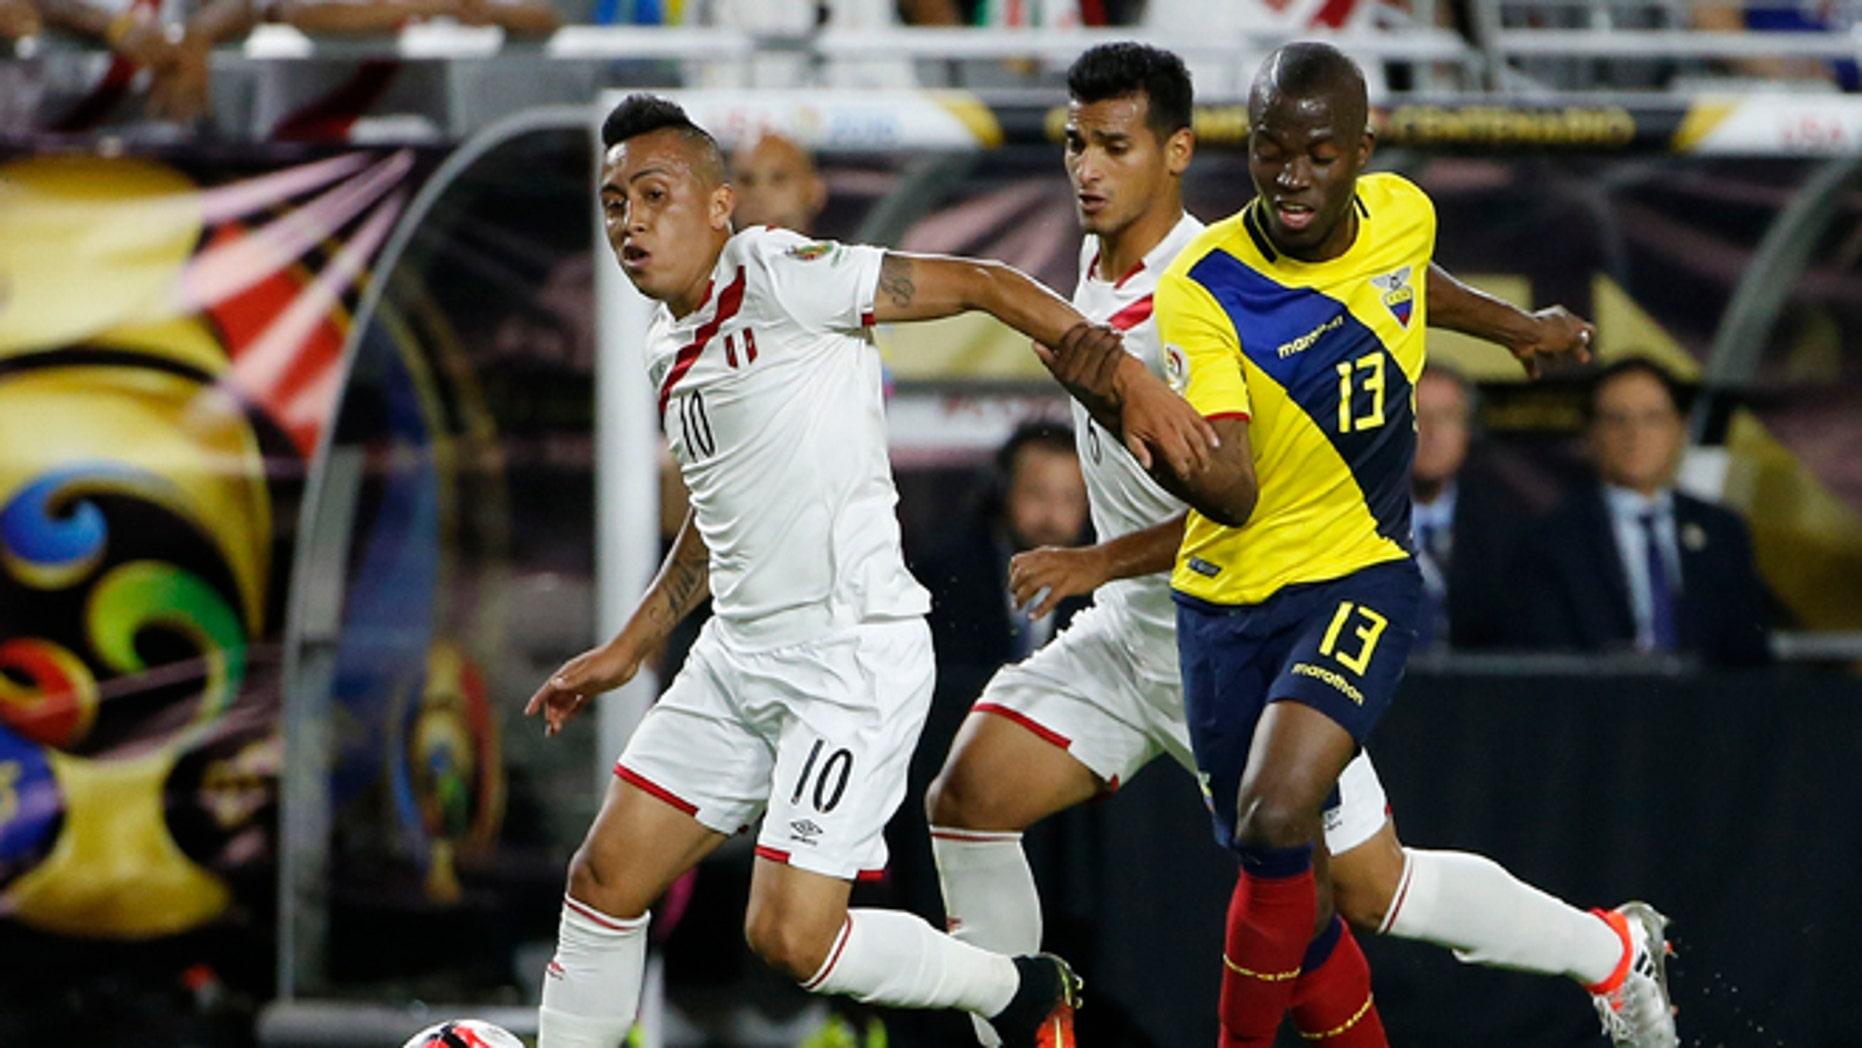 Peru's Christian Cueva dribbles the ball away from Ecuador's Enner Valencia on June 8, 2016, in Glendale, Ariz.